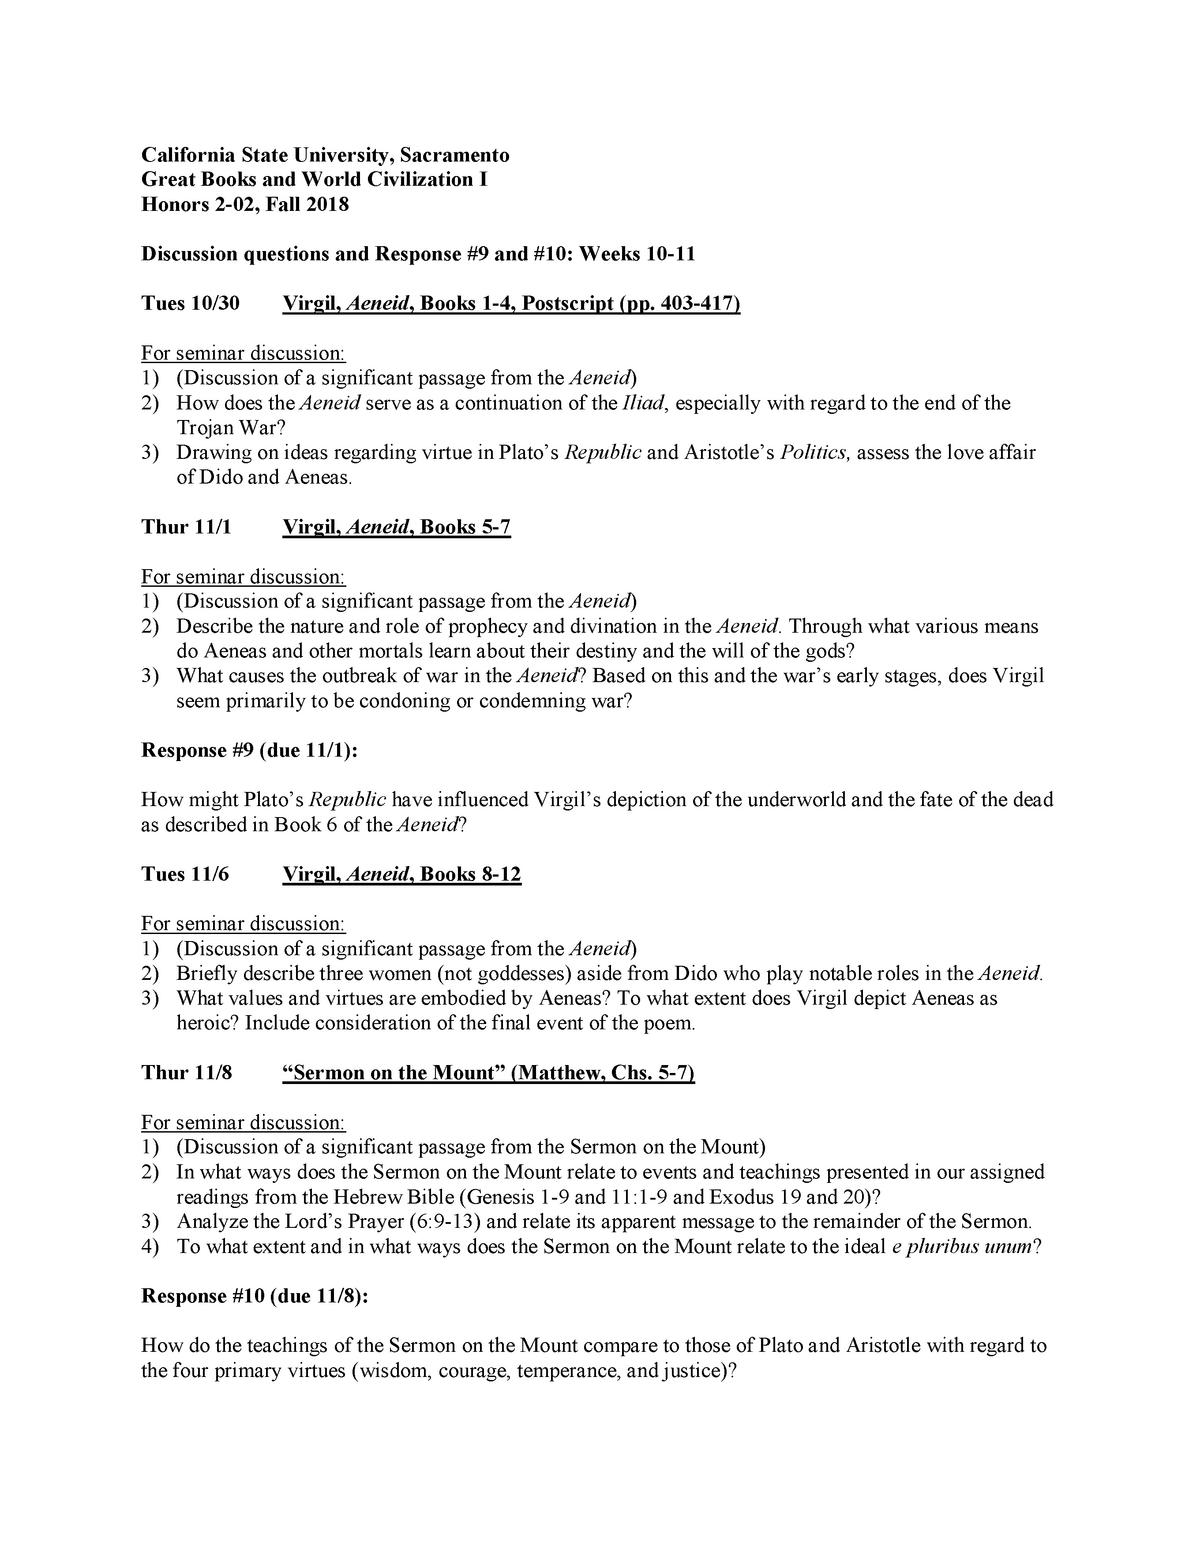 HONR2-02 Response 9, 10, Aeneid, Matthew - HONR 2: Great Books and